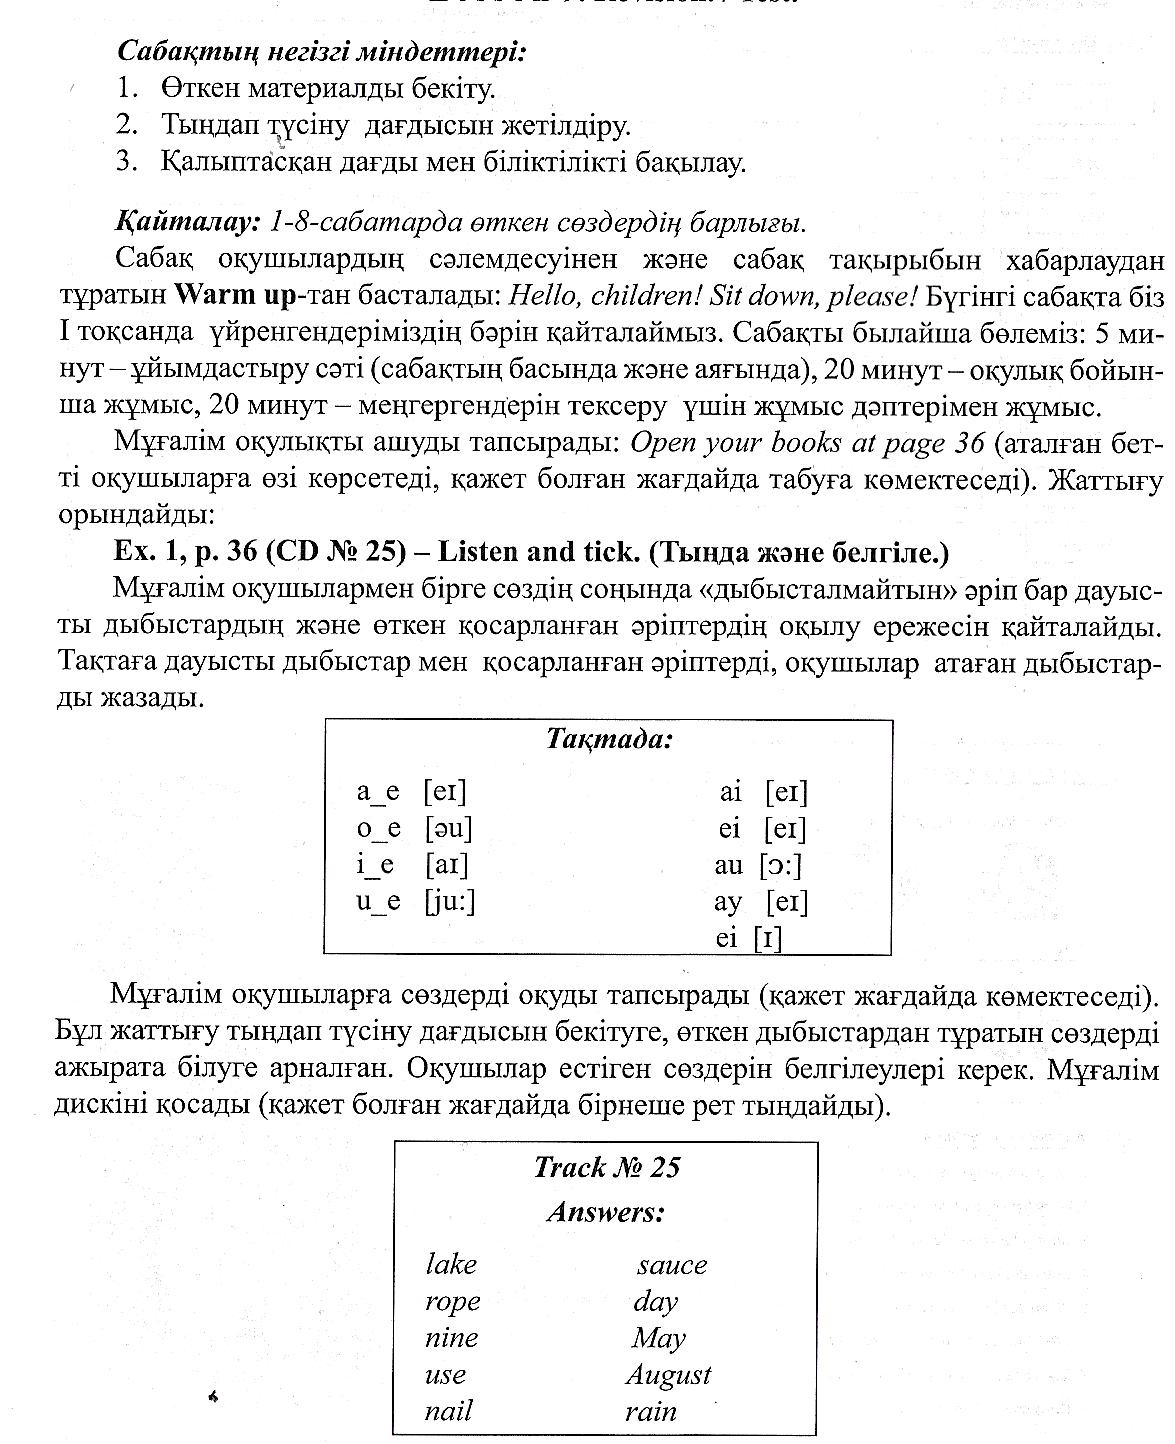 C:\Documents and Settings\User\Local Settings\Temporary Internet Files\Content.Word\сканирование0001.jpg